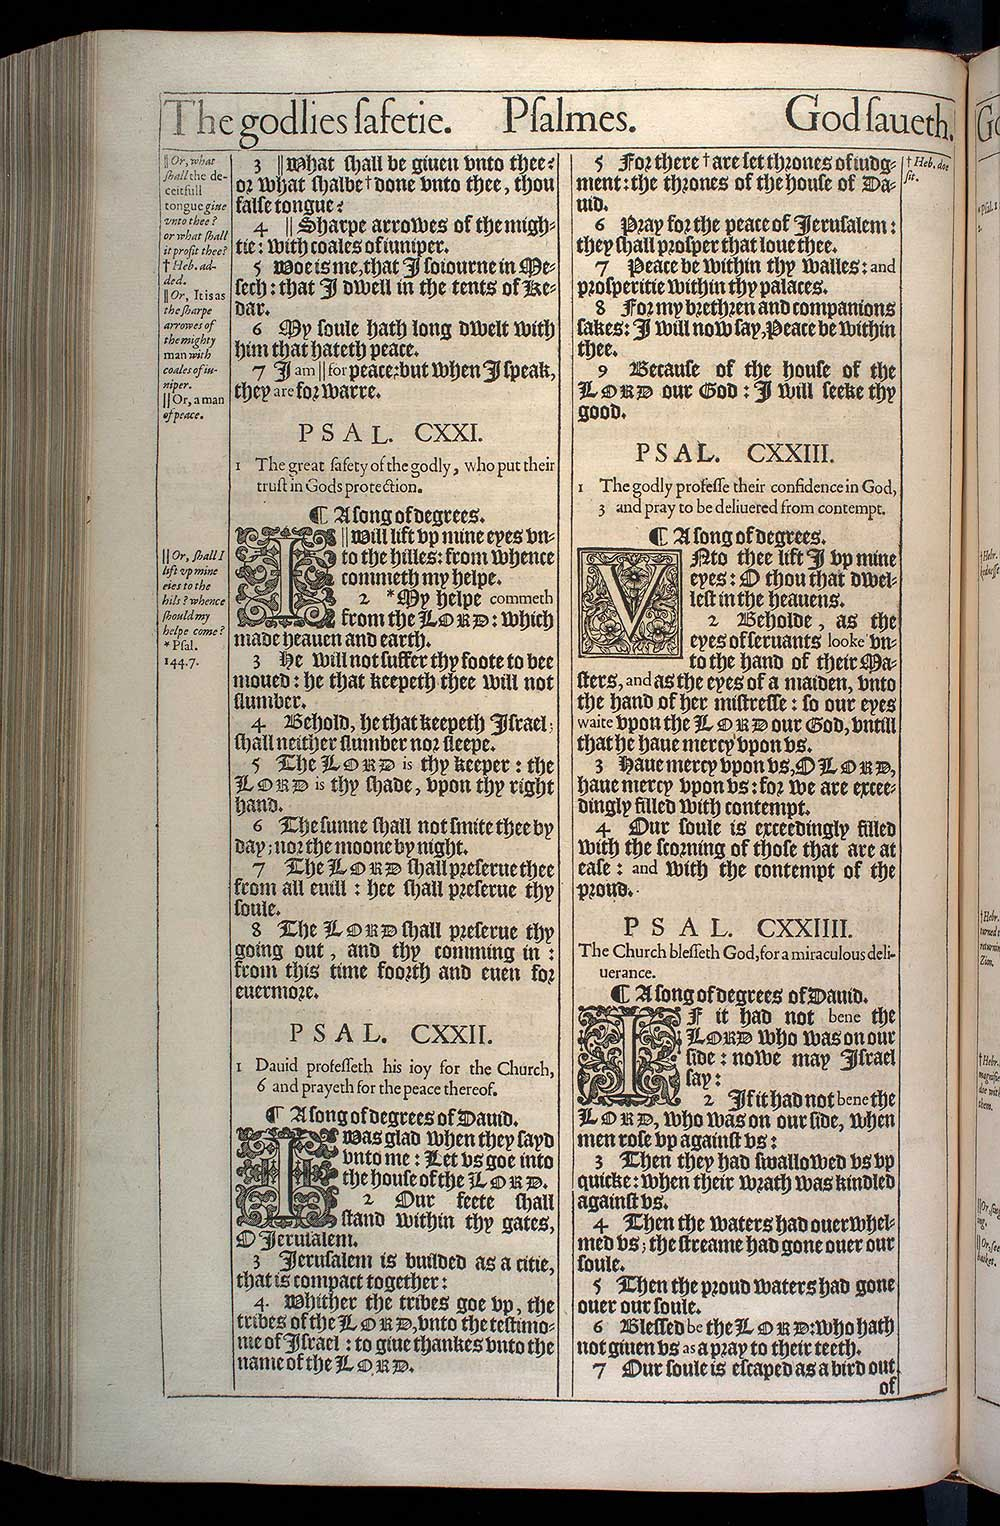 Psalms Chapter 121 Original 1611 Bible Scan